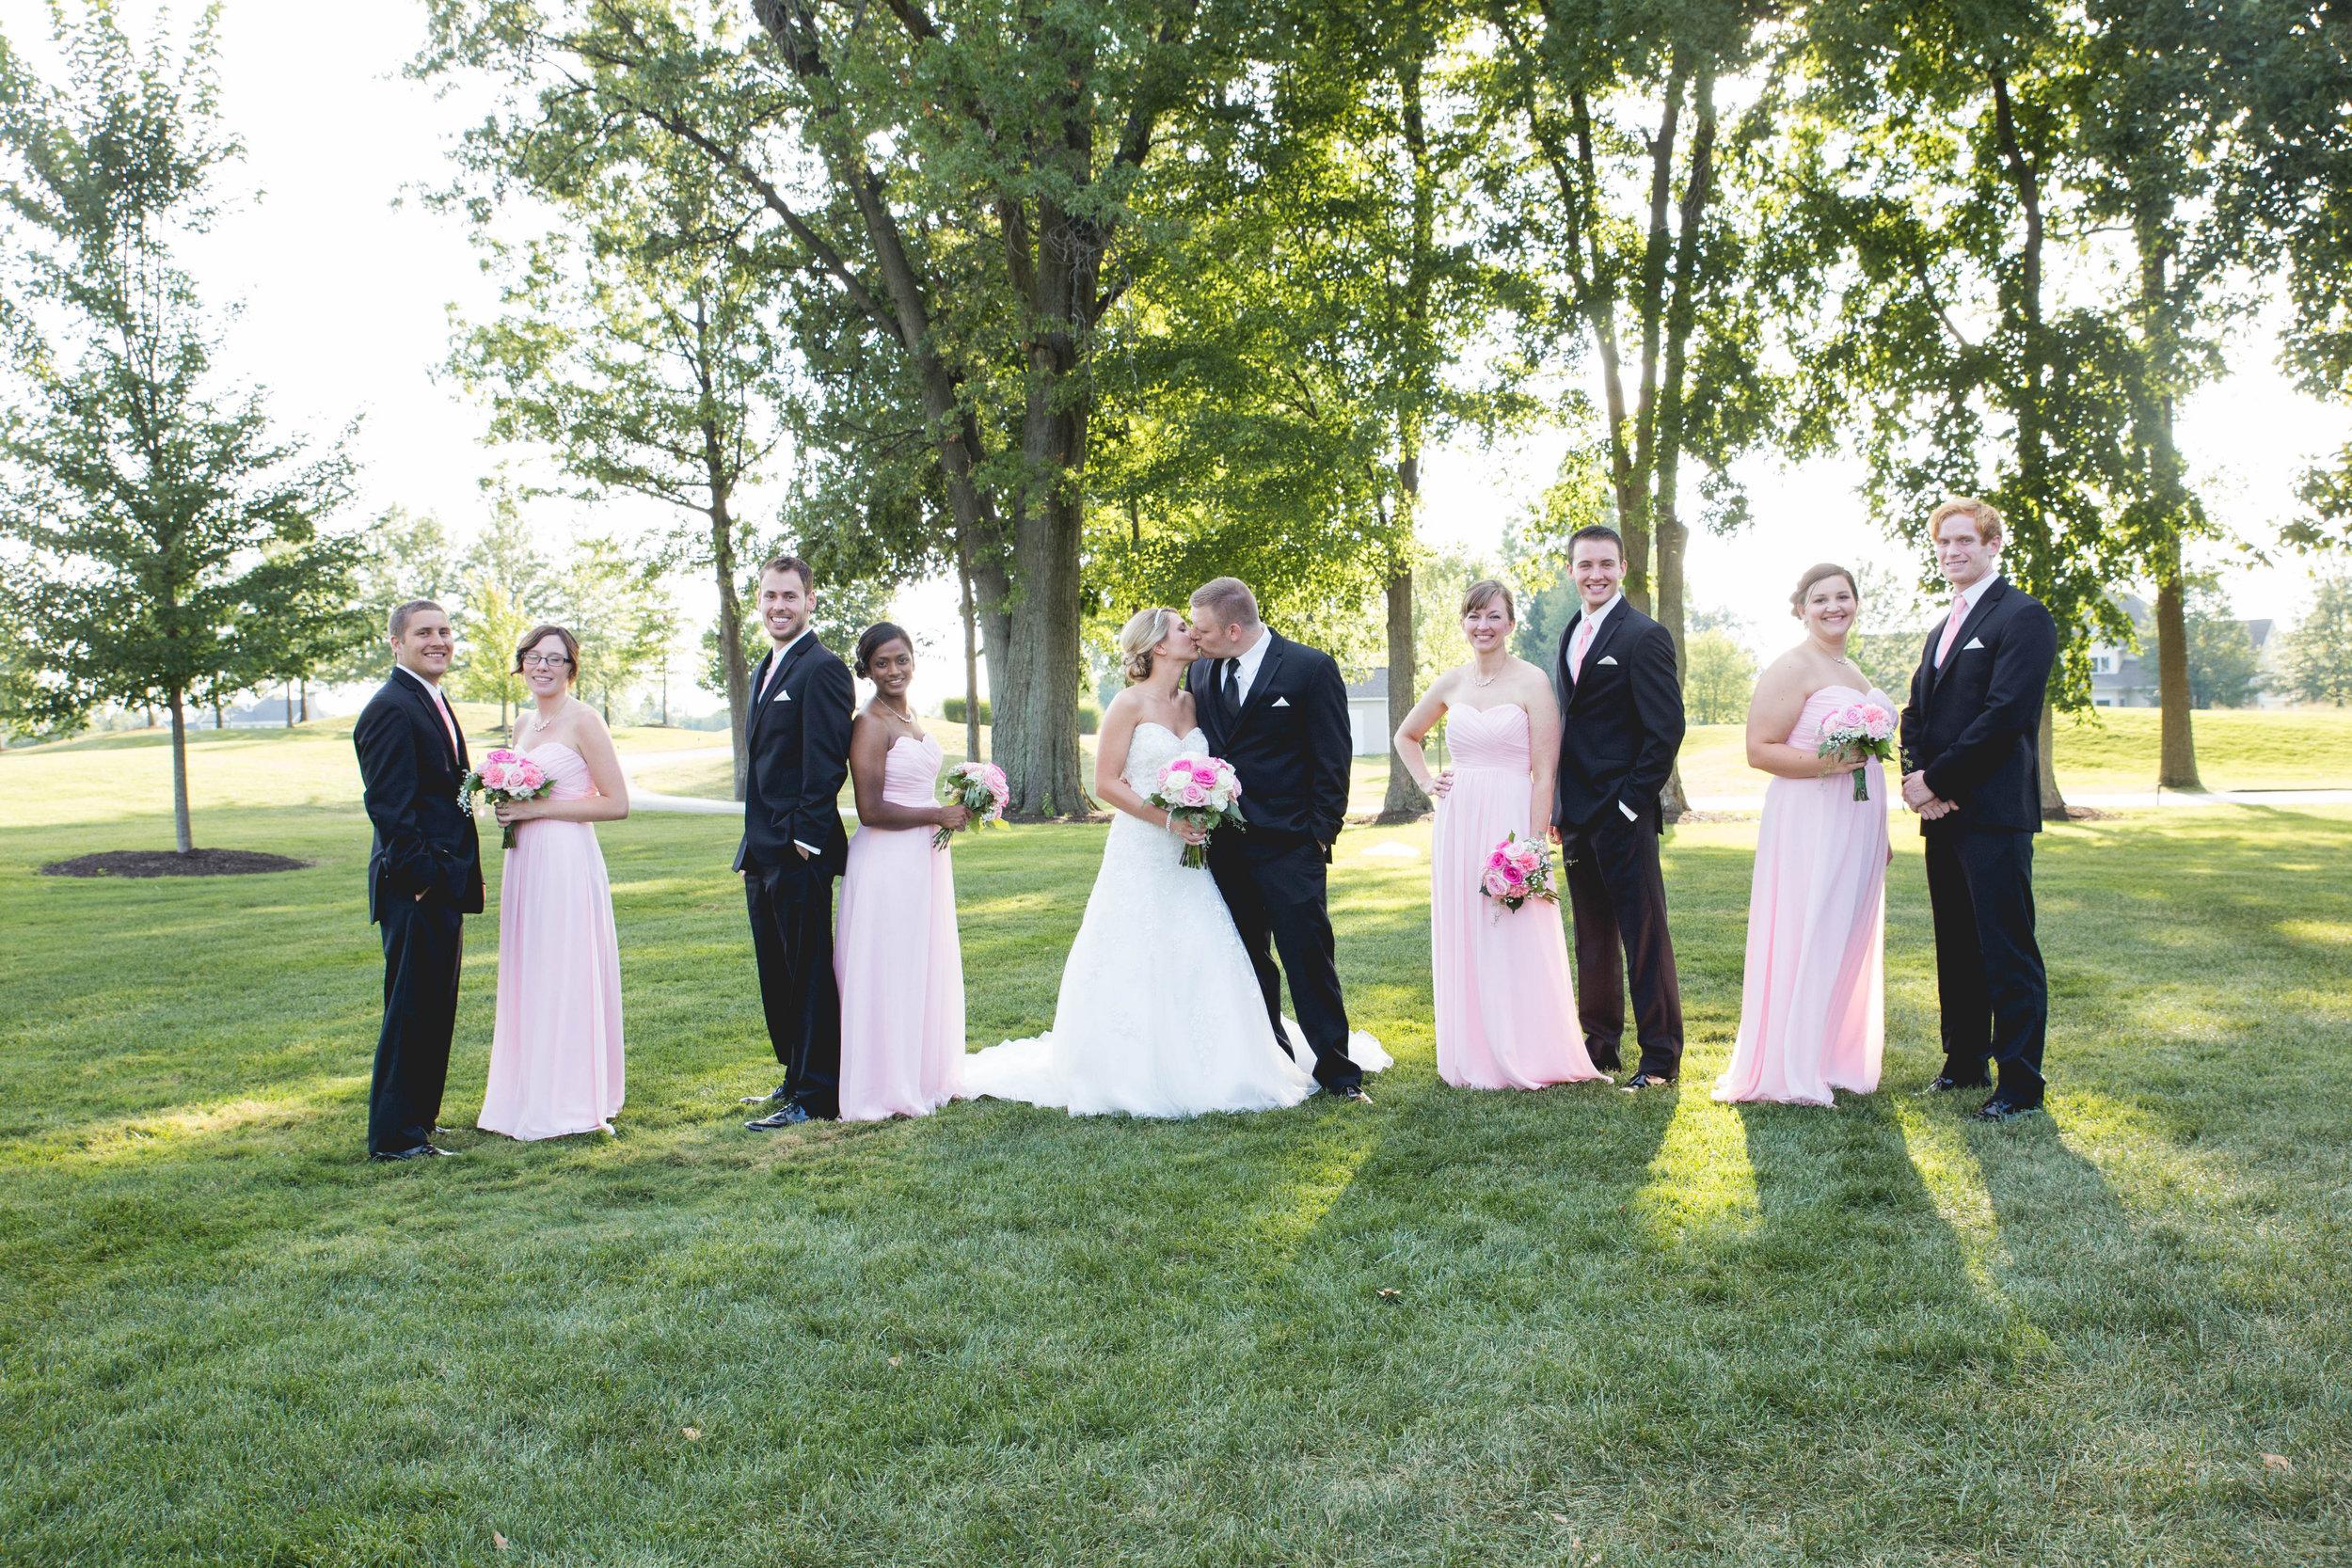 Donelson Wedding-Donelson-0376.jpg